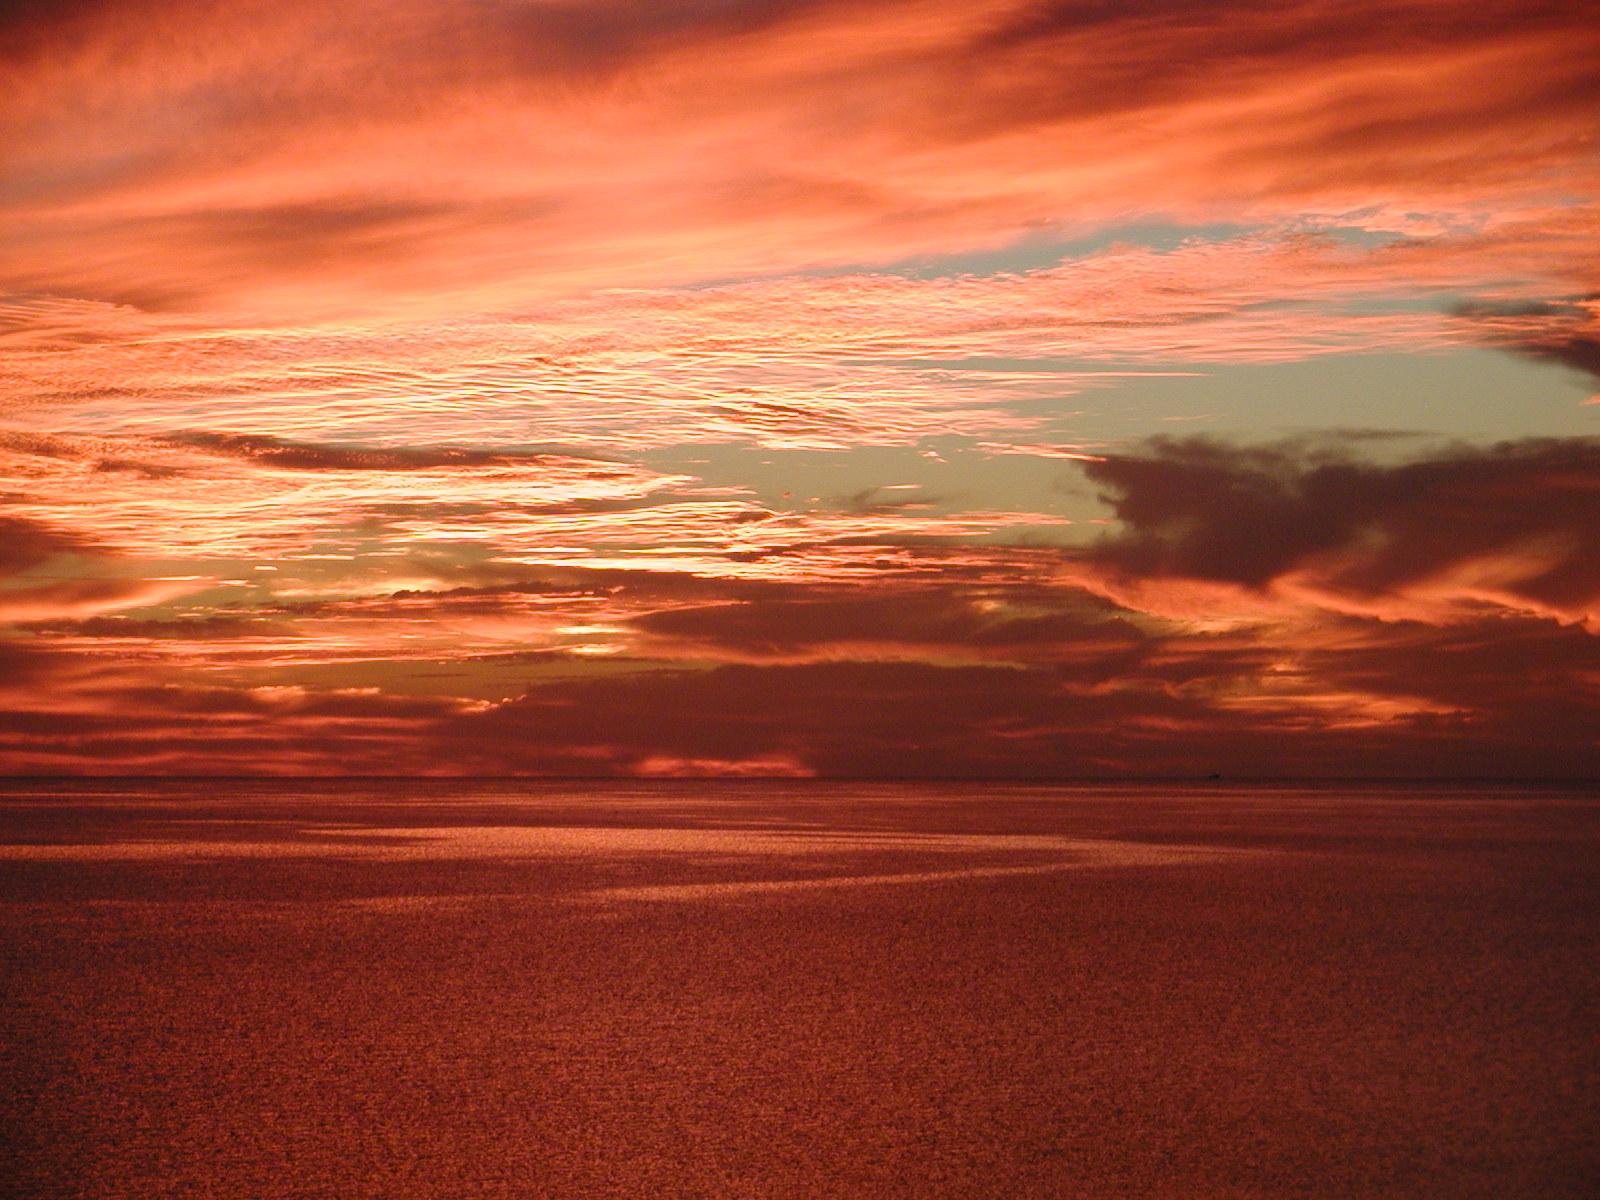 Flame evening sky